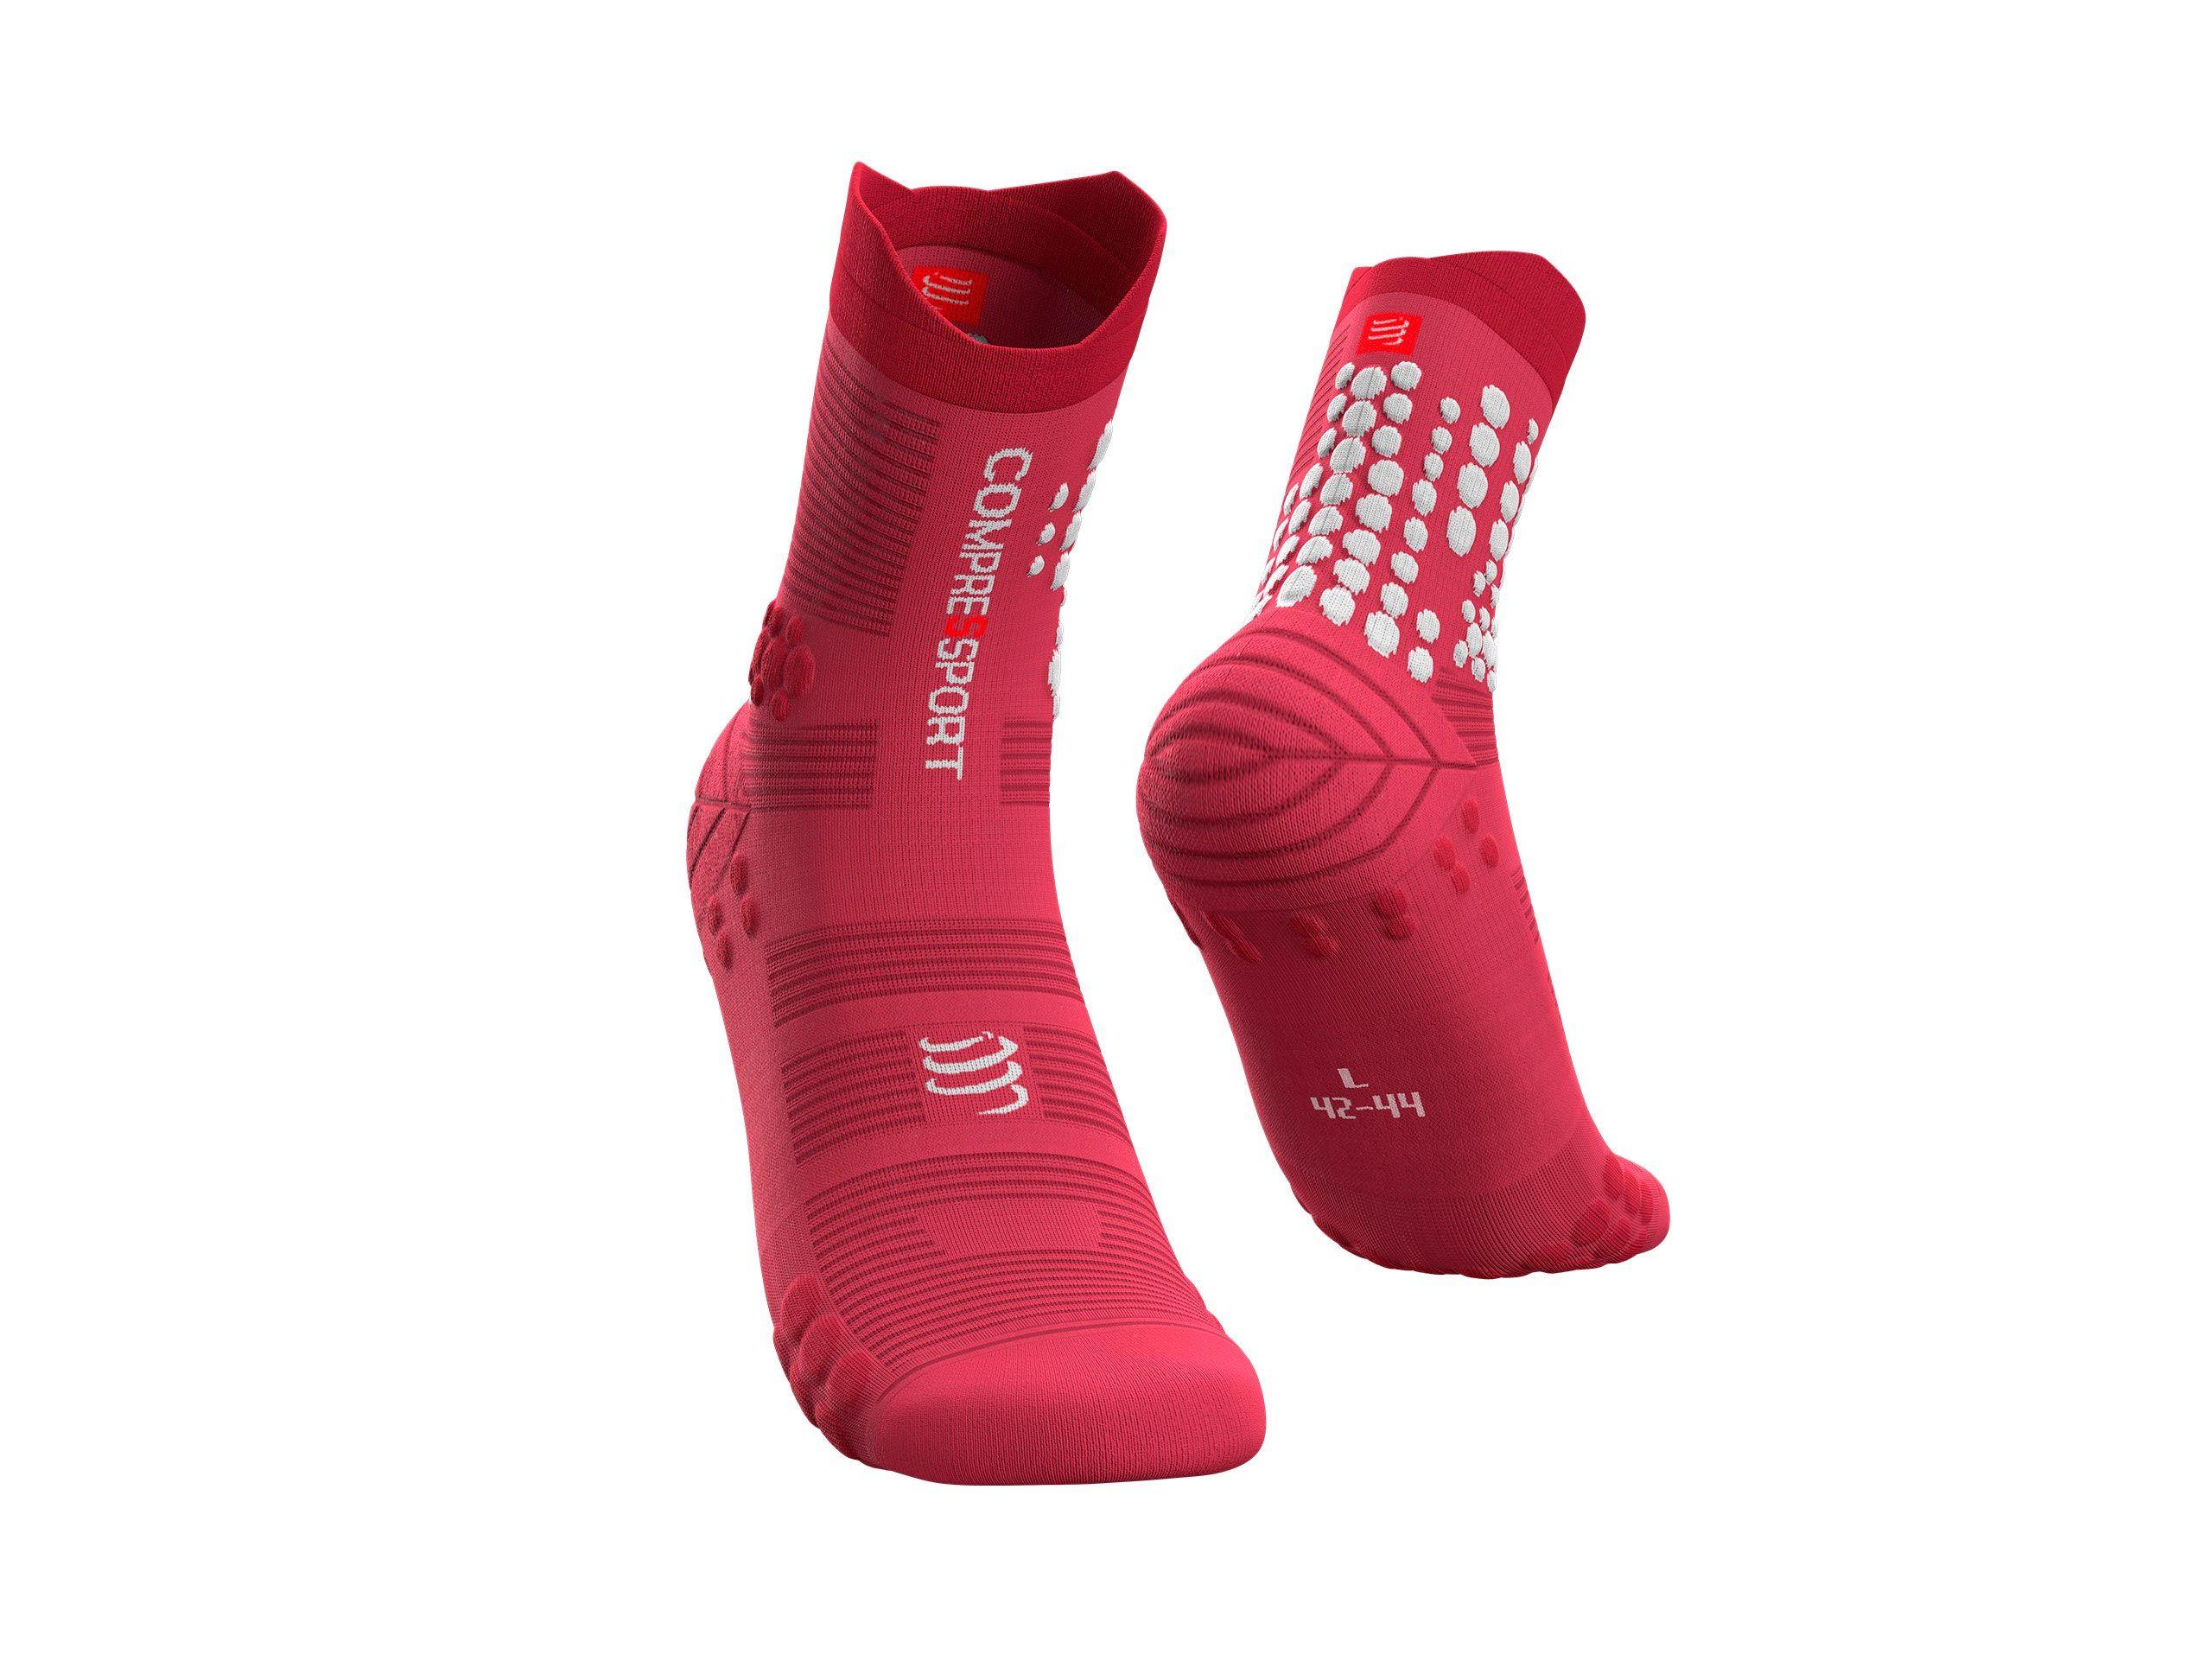 Pro Racing Socks v3.0 Trail Pink Garnet